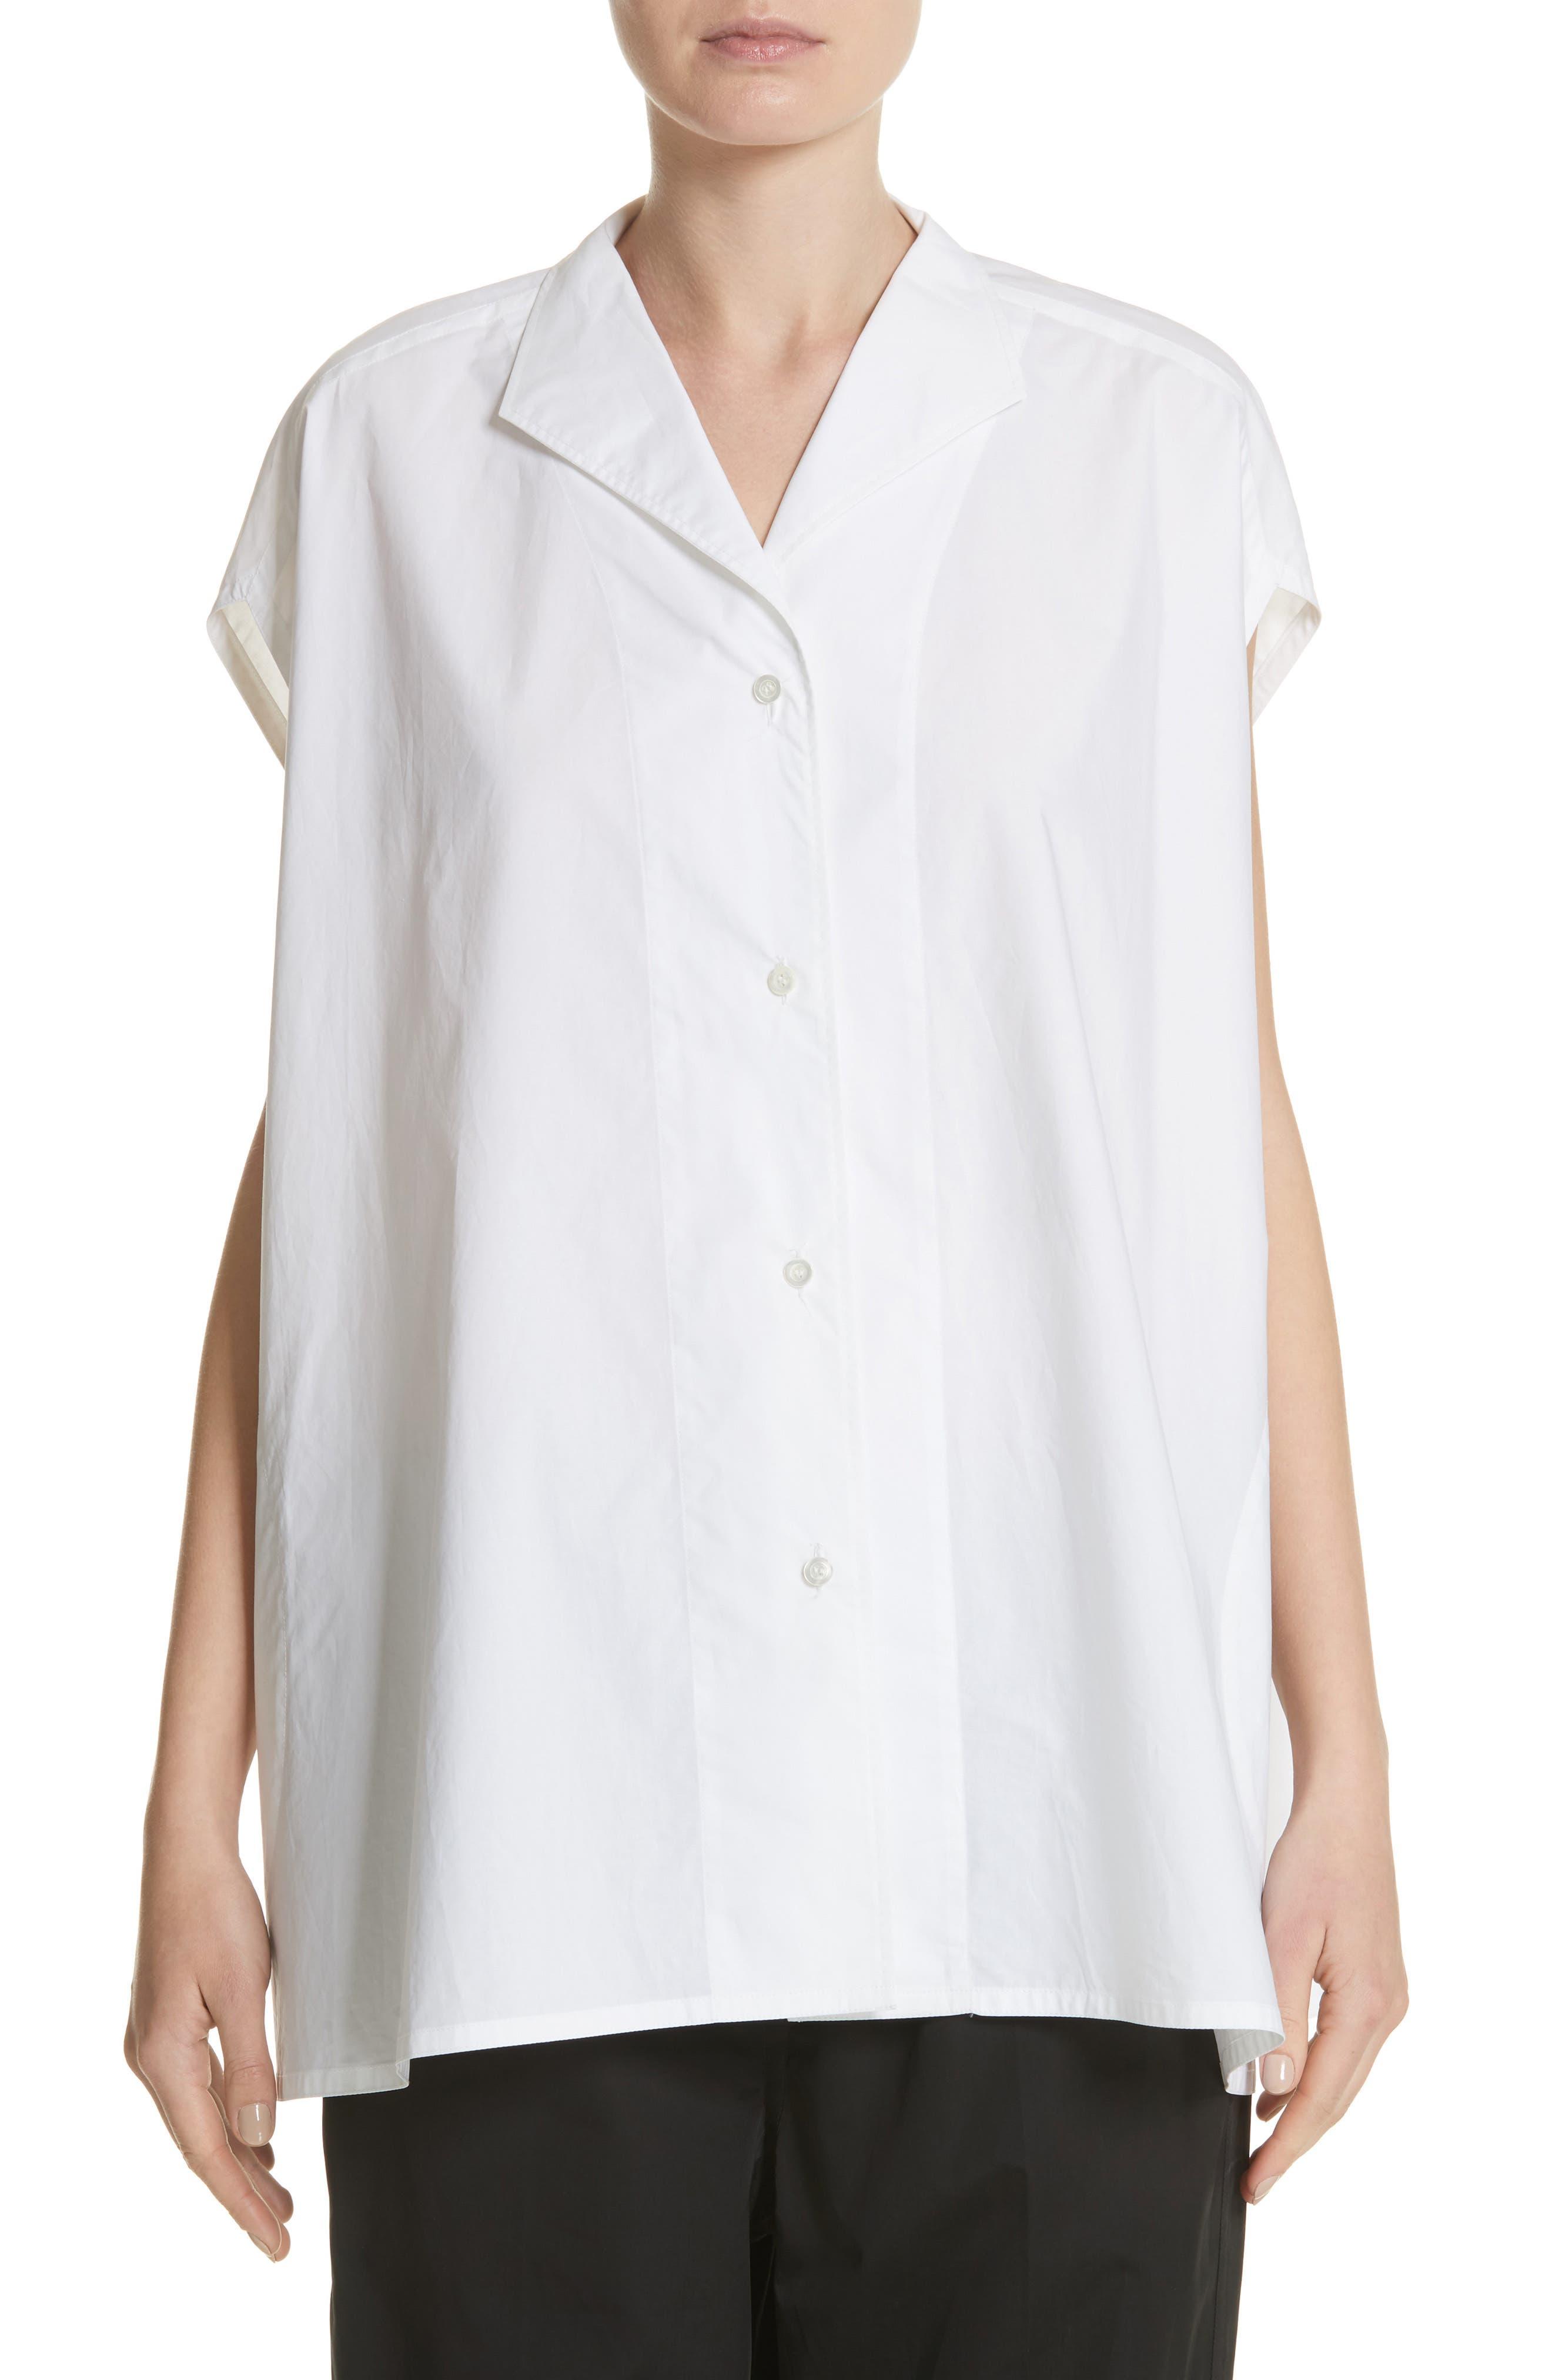 Alternate Image 1 Selected - Sofie D'Hoore Sleeveless Cotton Blouse